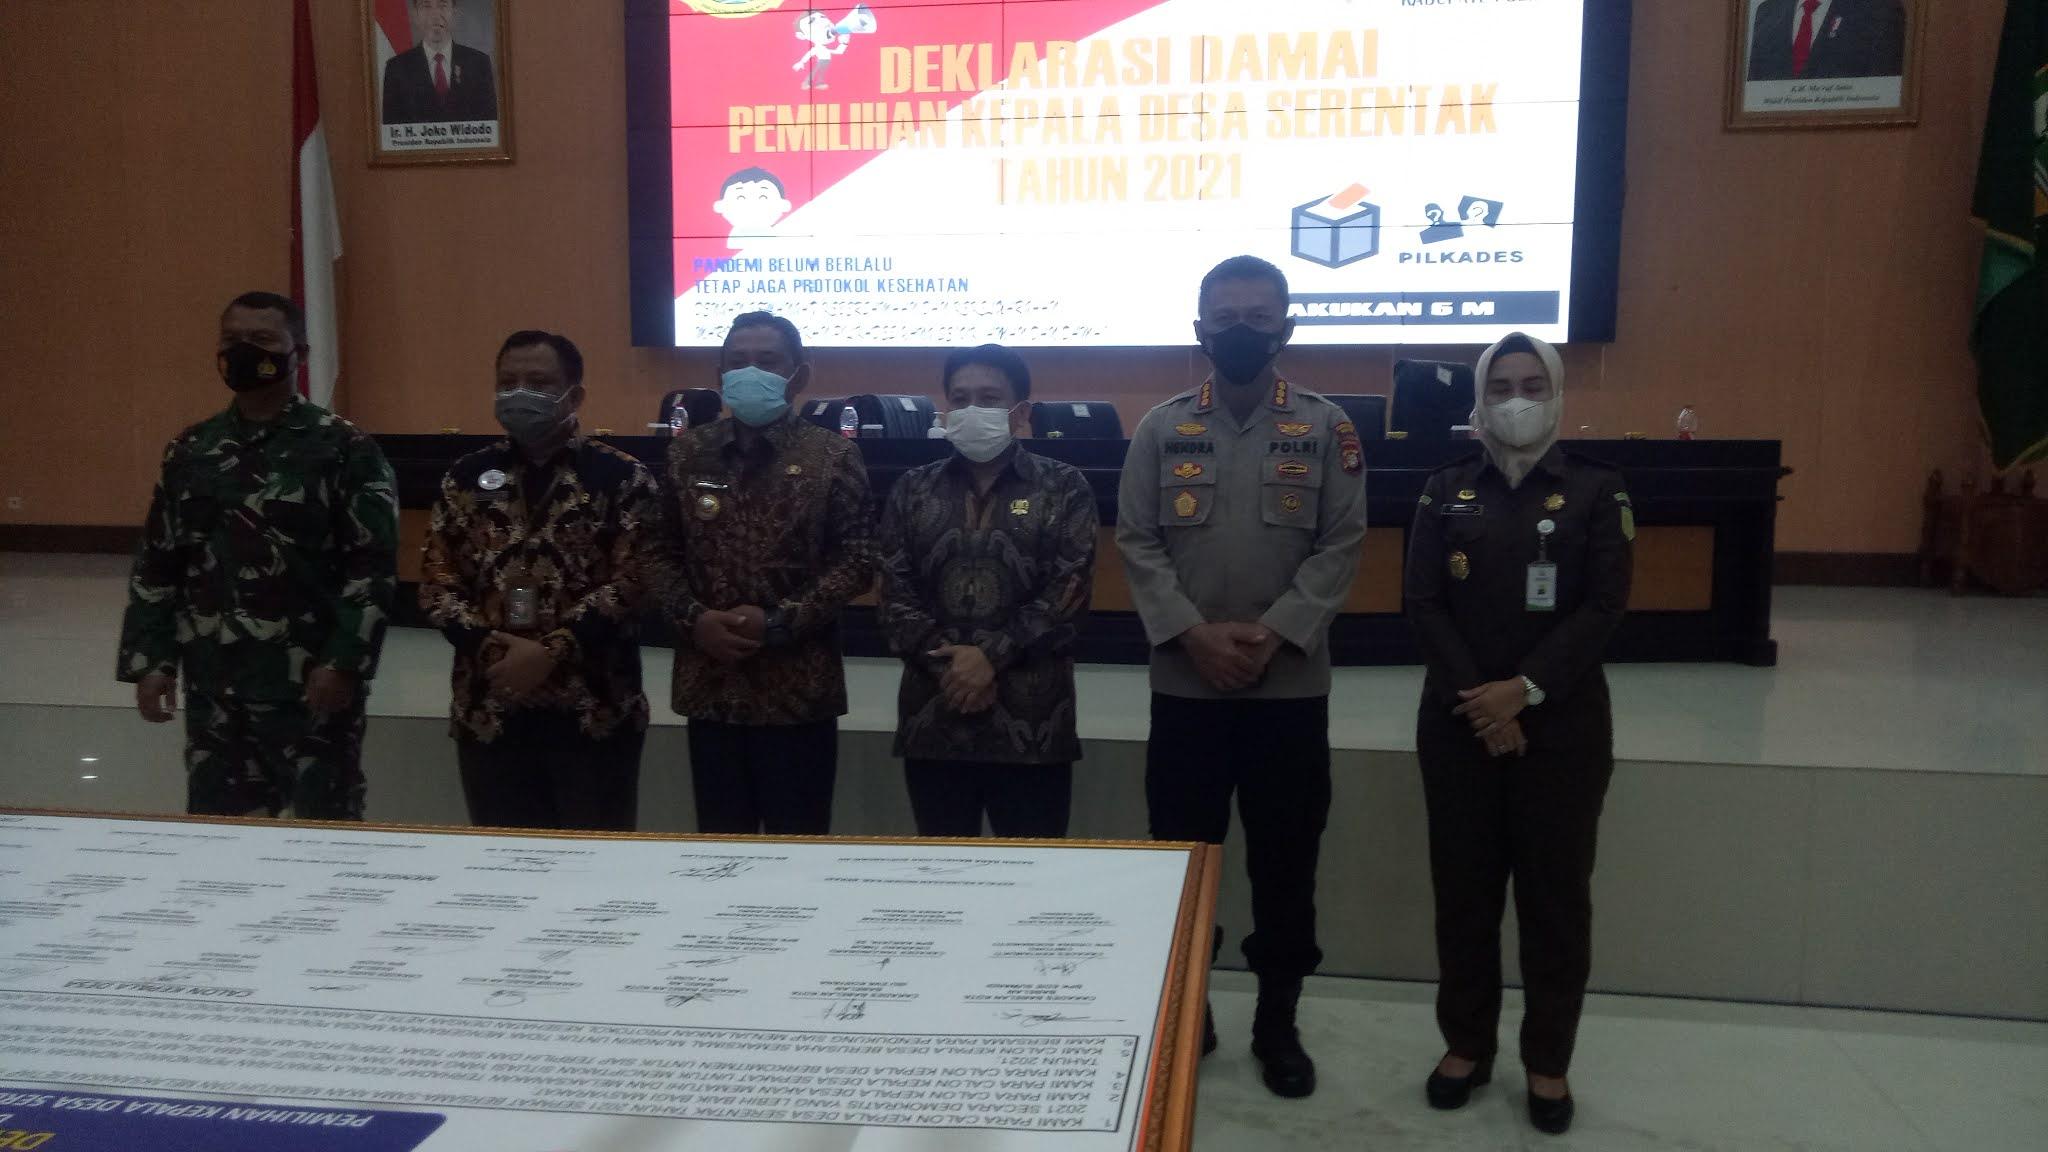 33 Calon Kades di Kabupaten Bekasi Tanda Tangani Deklarasi Damai